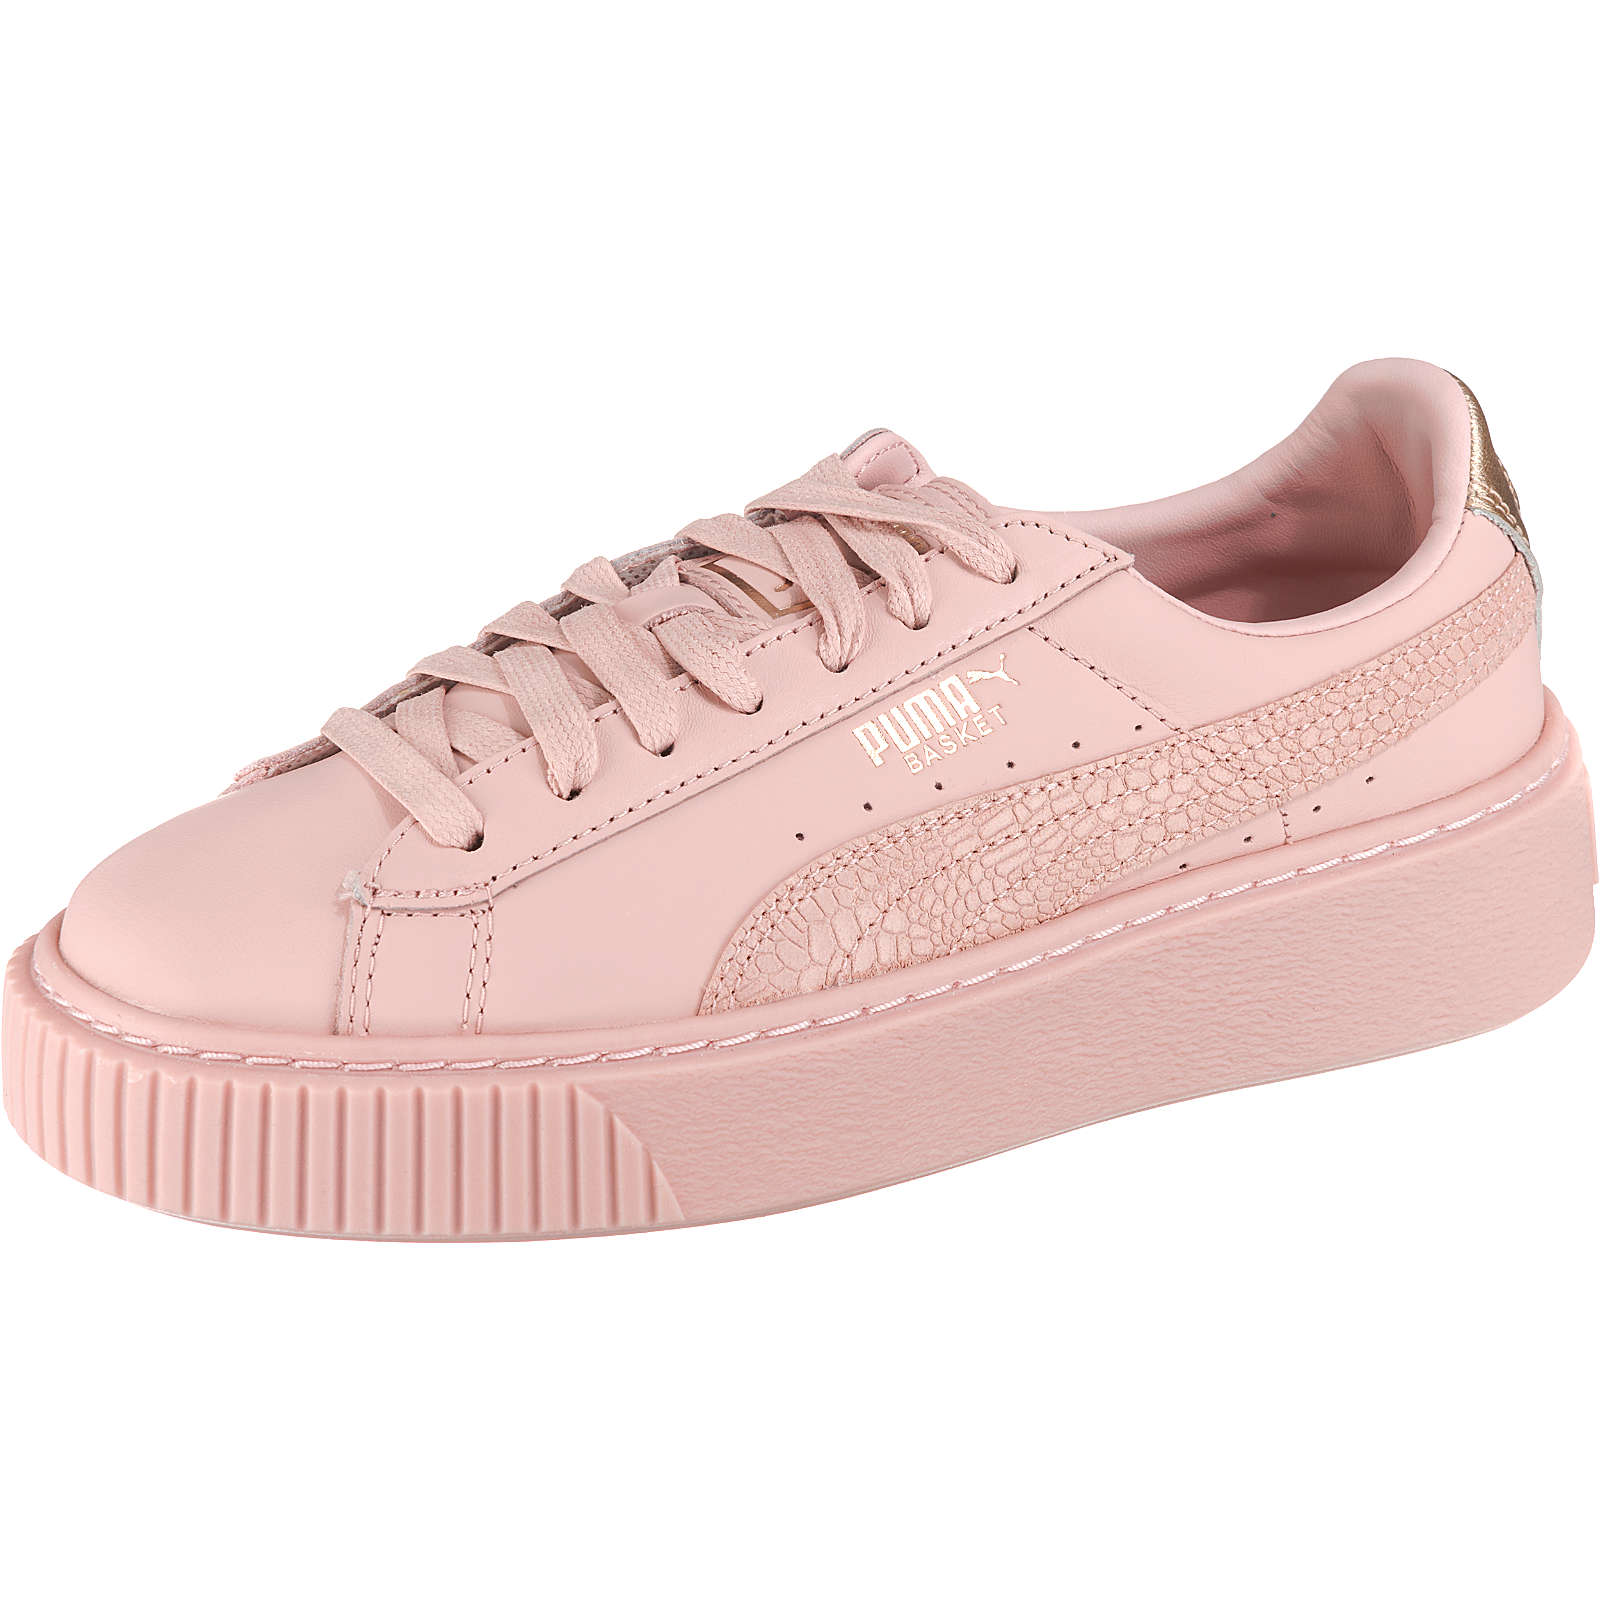 PUMA Basket Platform Euphoria RG Sneakers pink Damen Gr. 37